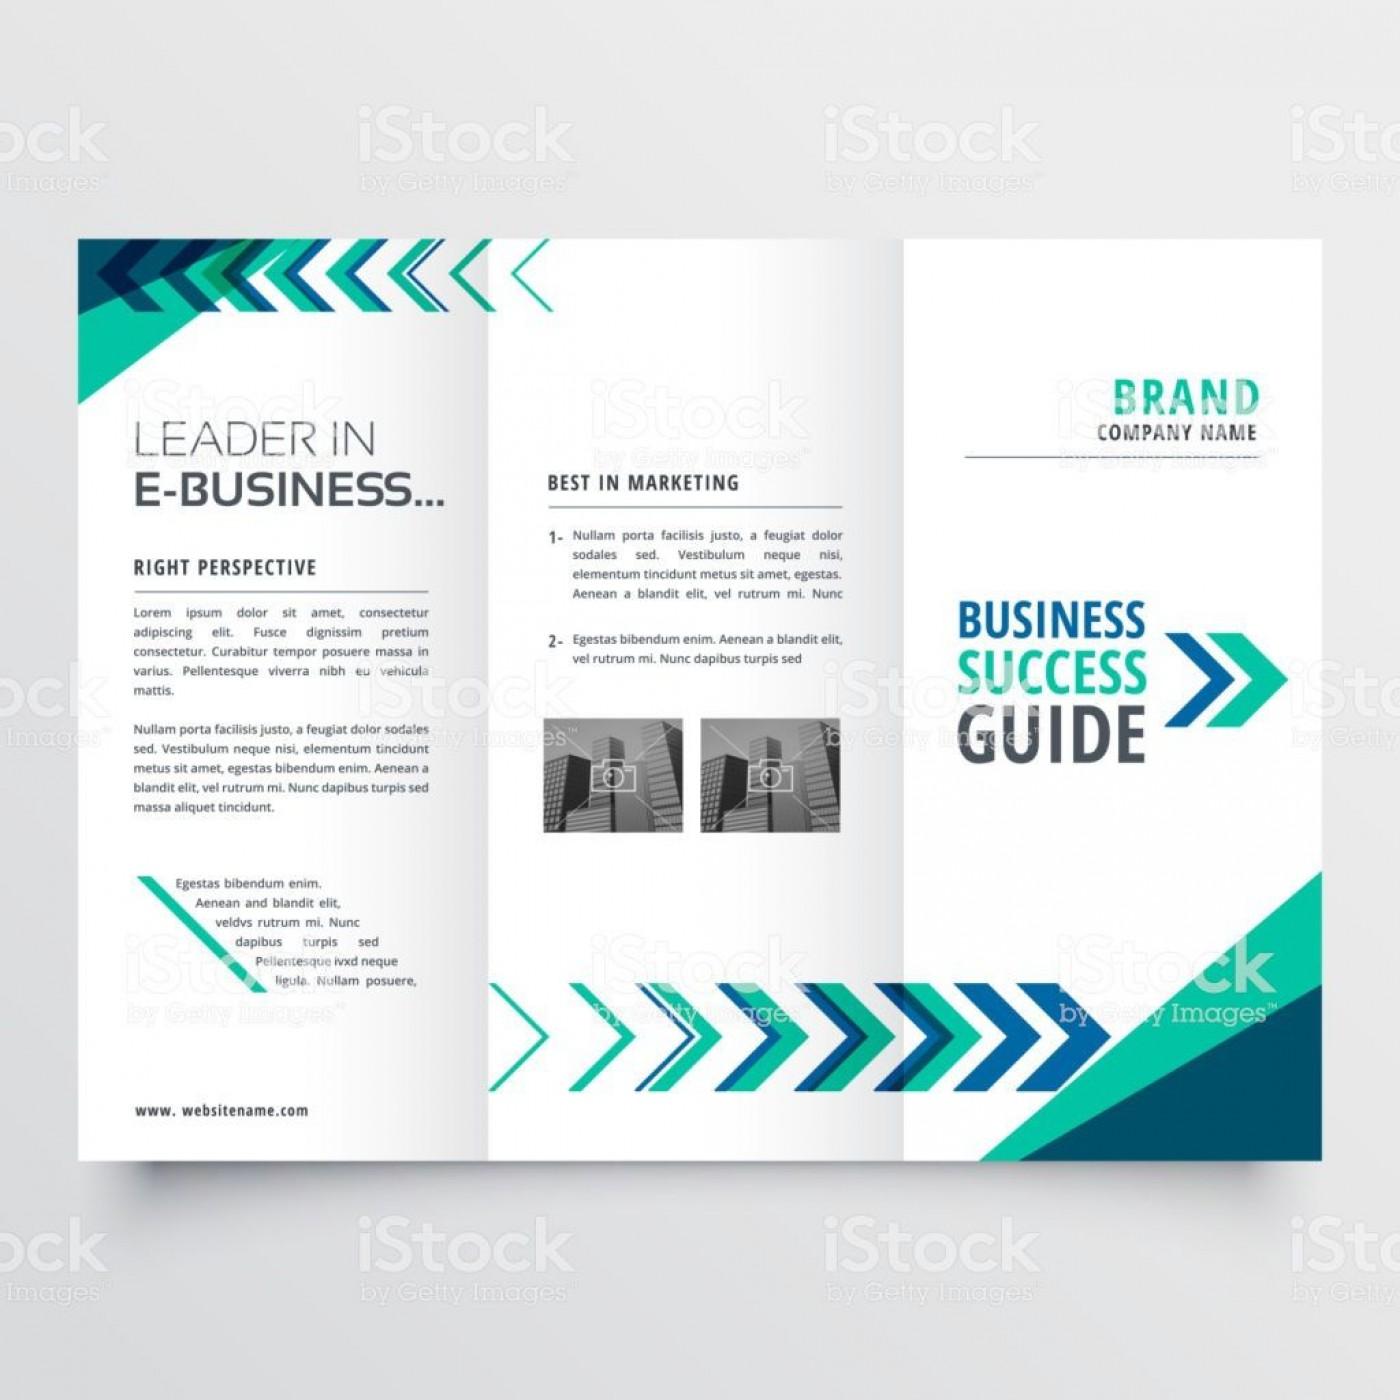 006 Stupendou Tri Fold Brochure Template Free High Resolution  Download Photoshop M Word Tri-fold Indesign Mac1400